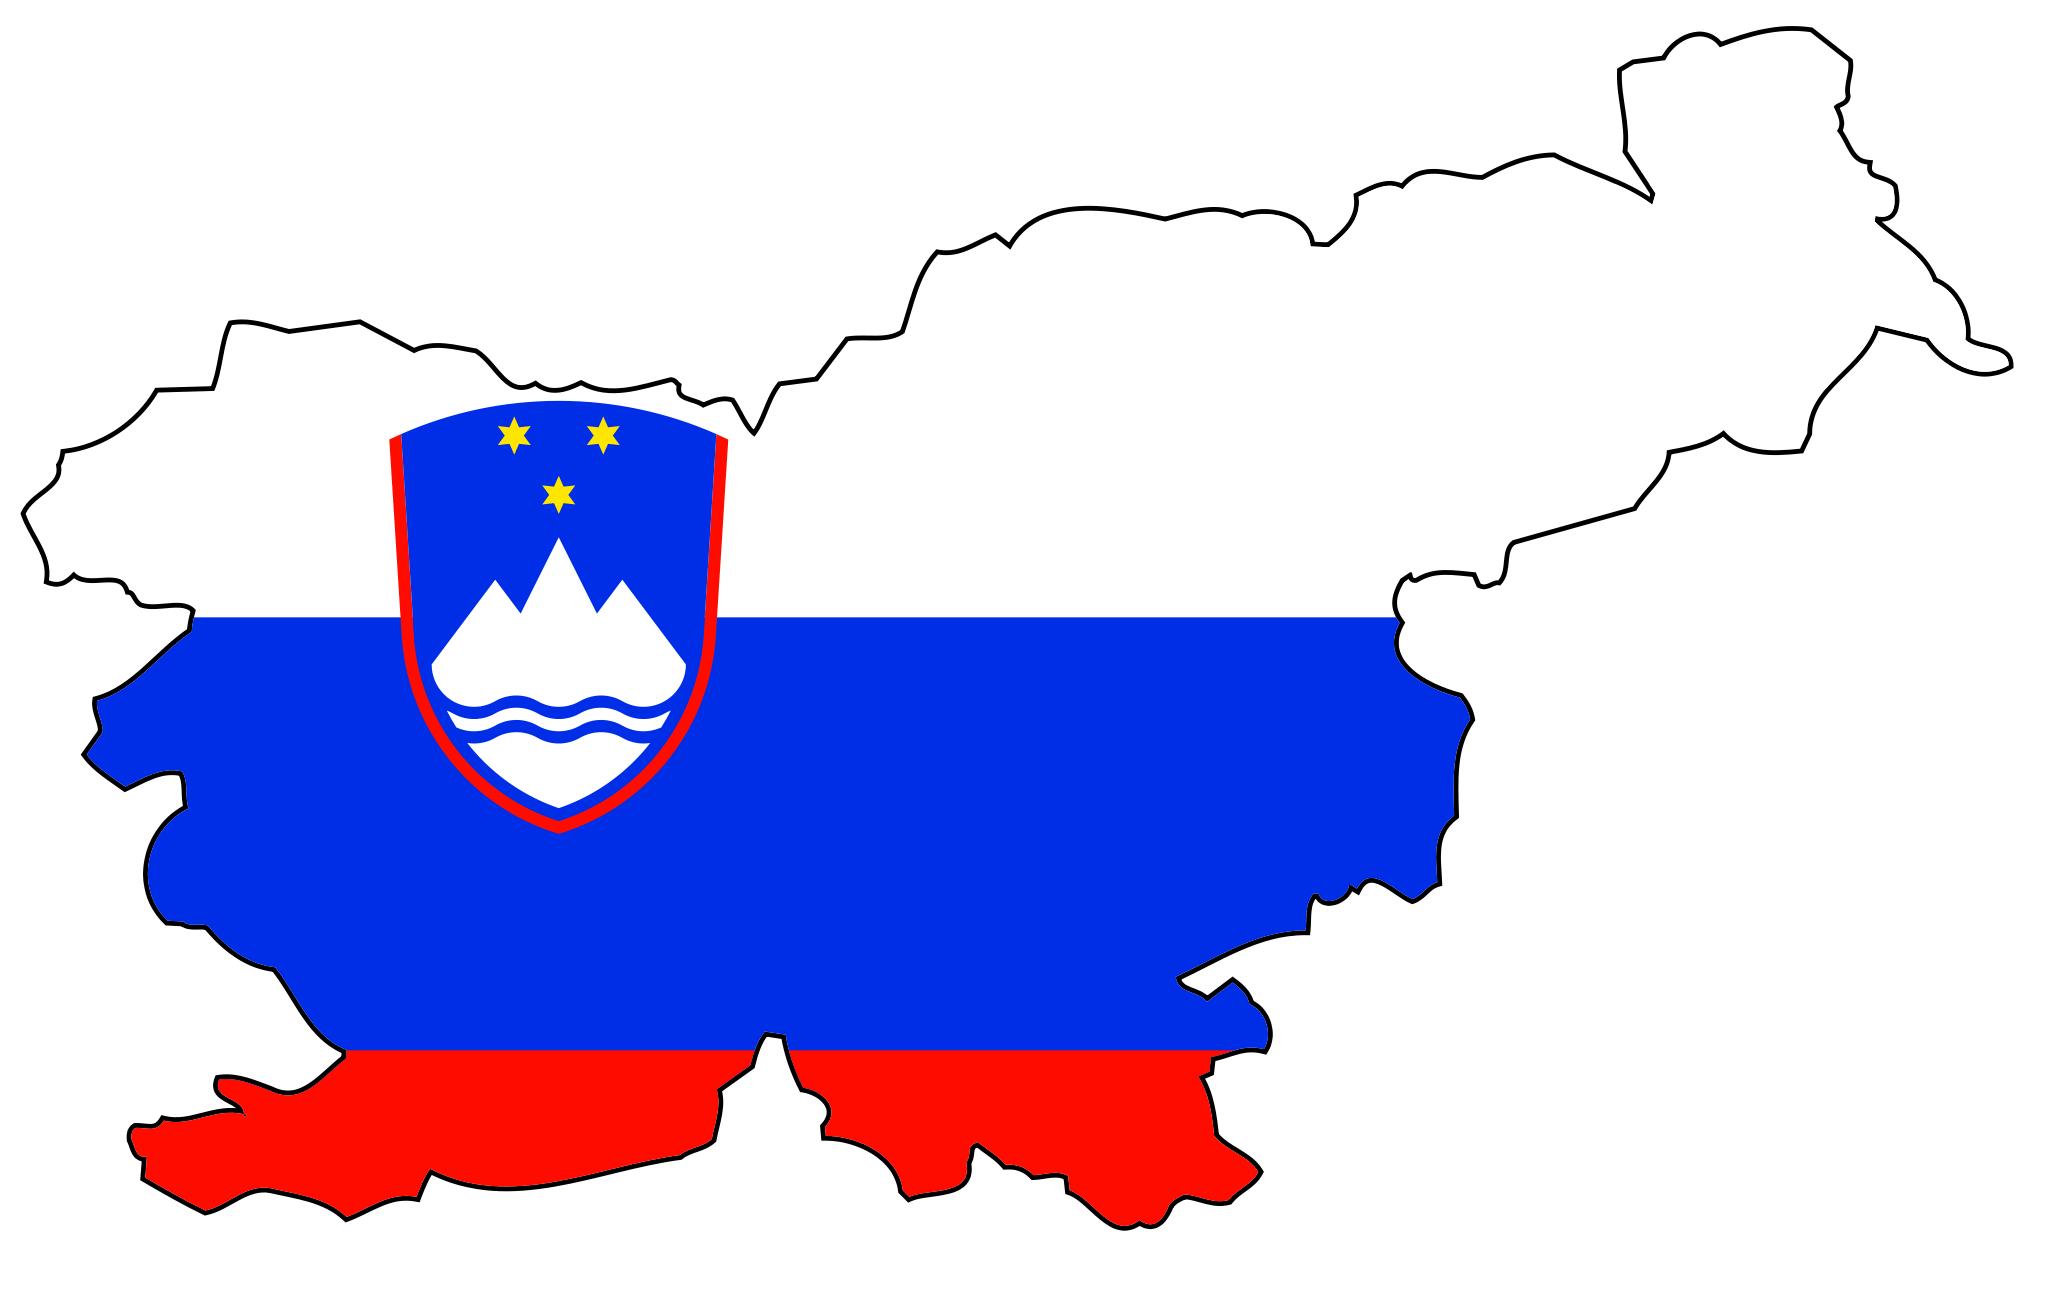 Waterfalls in Slovenia